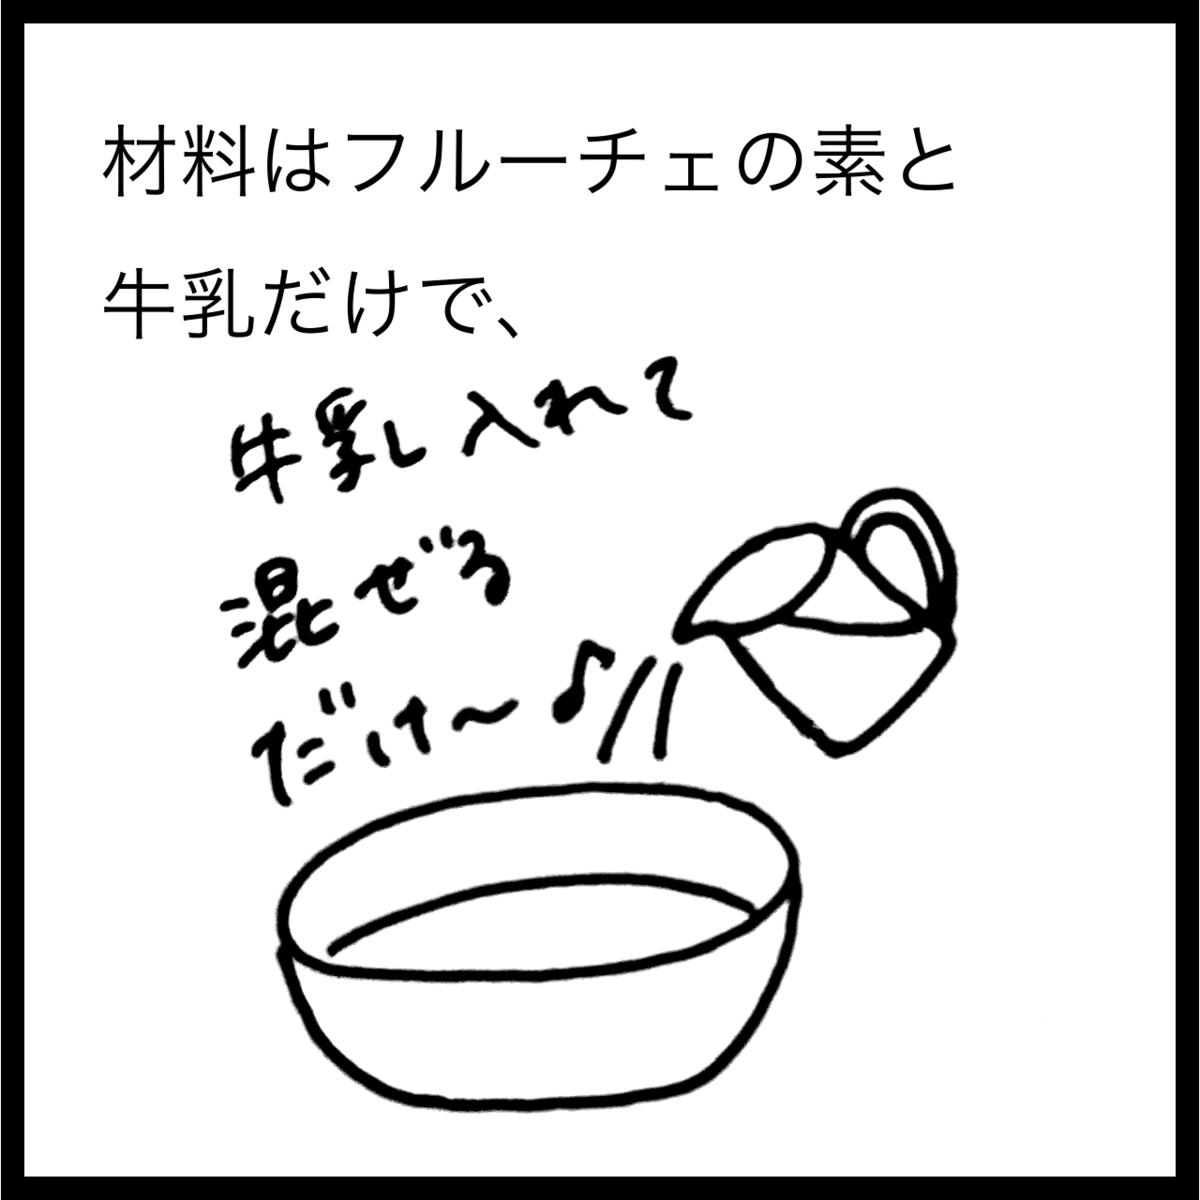 f:id:komyusyomama:20210920215913p:plain